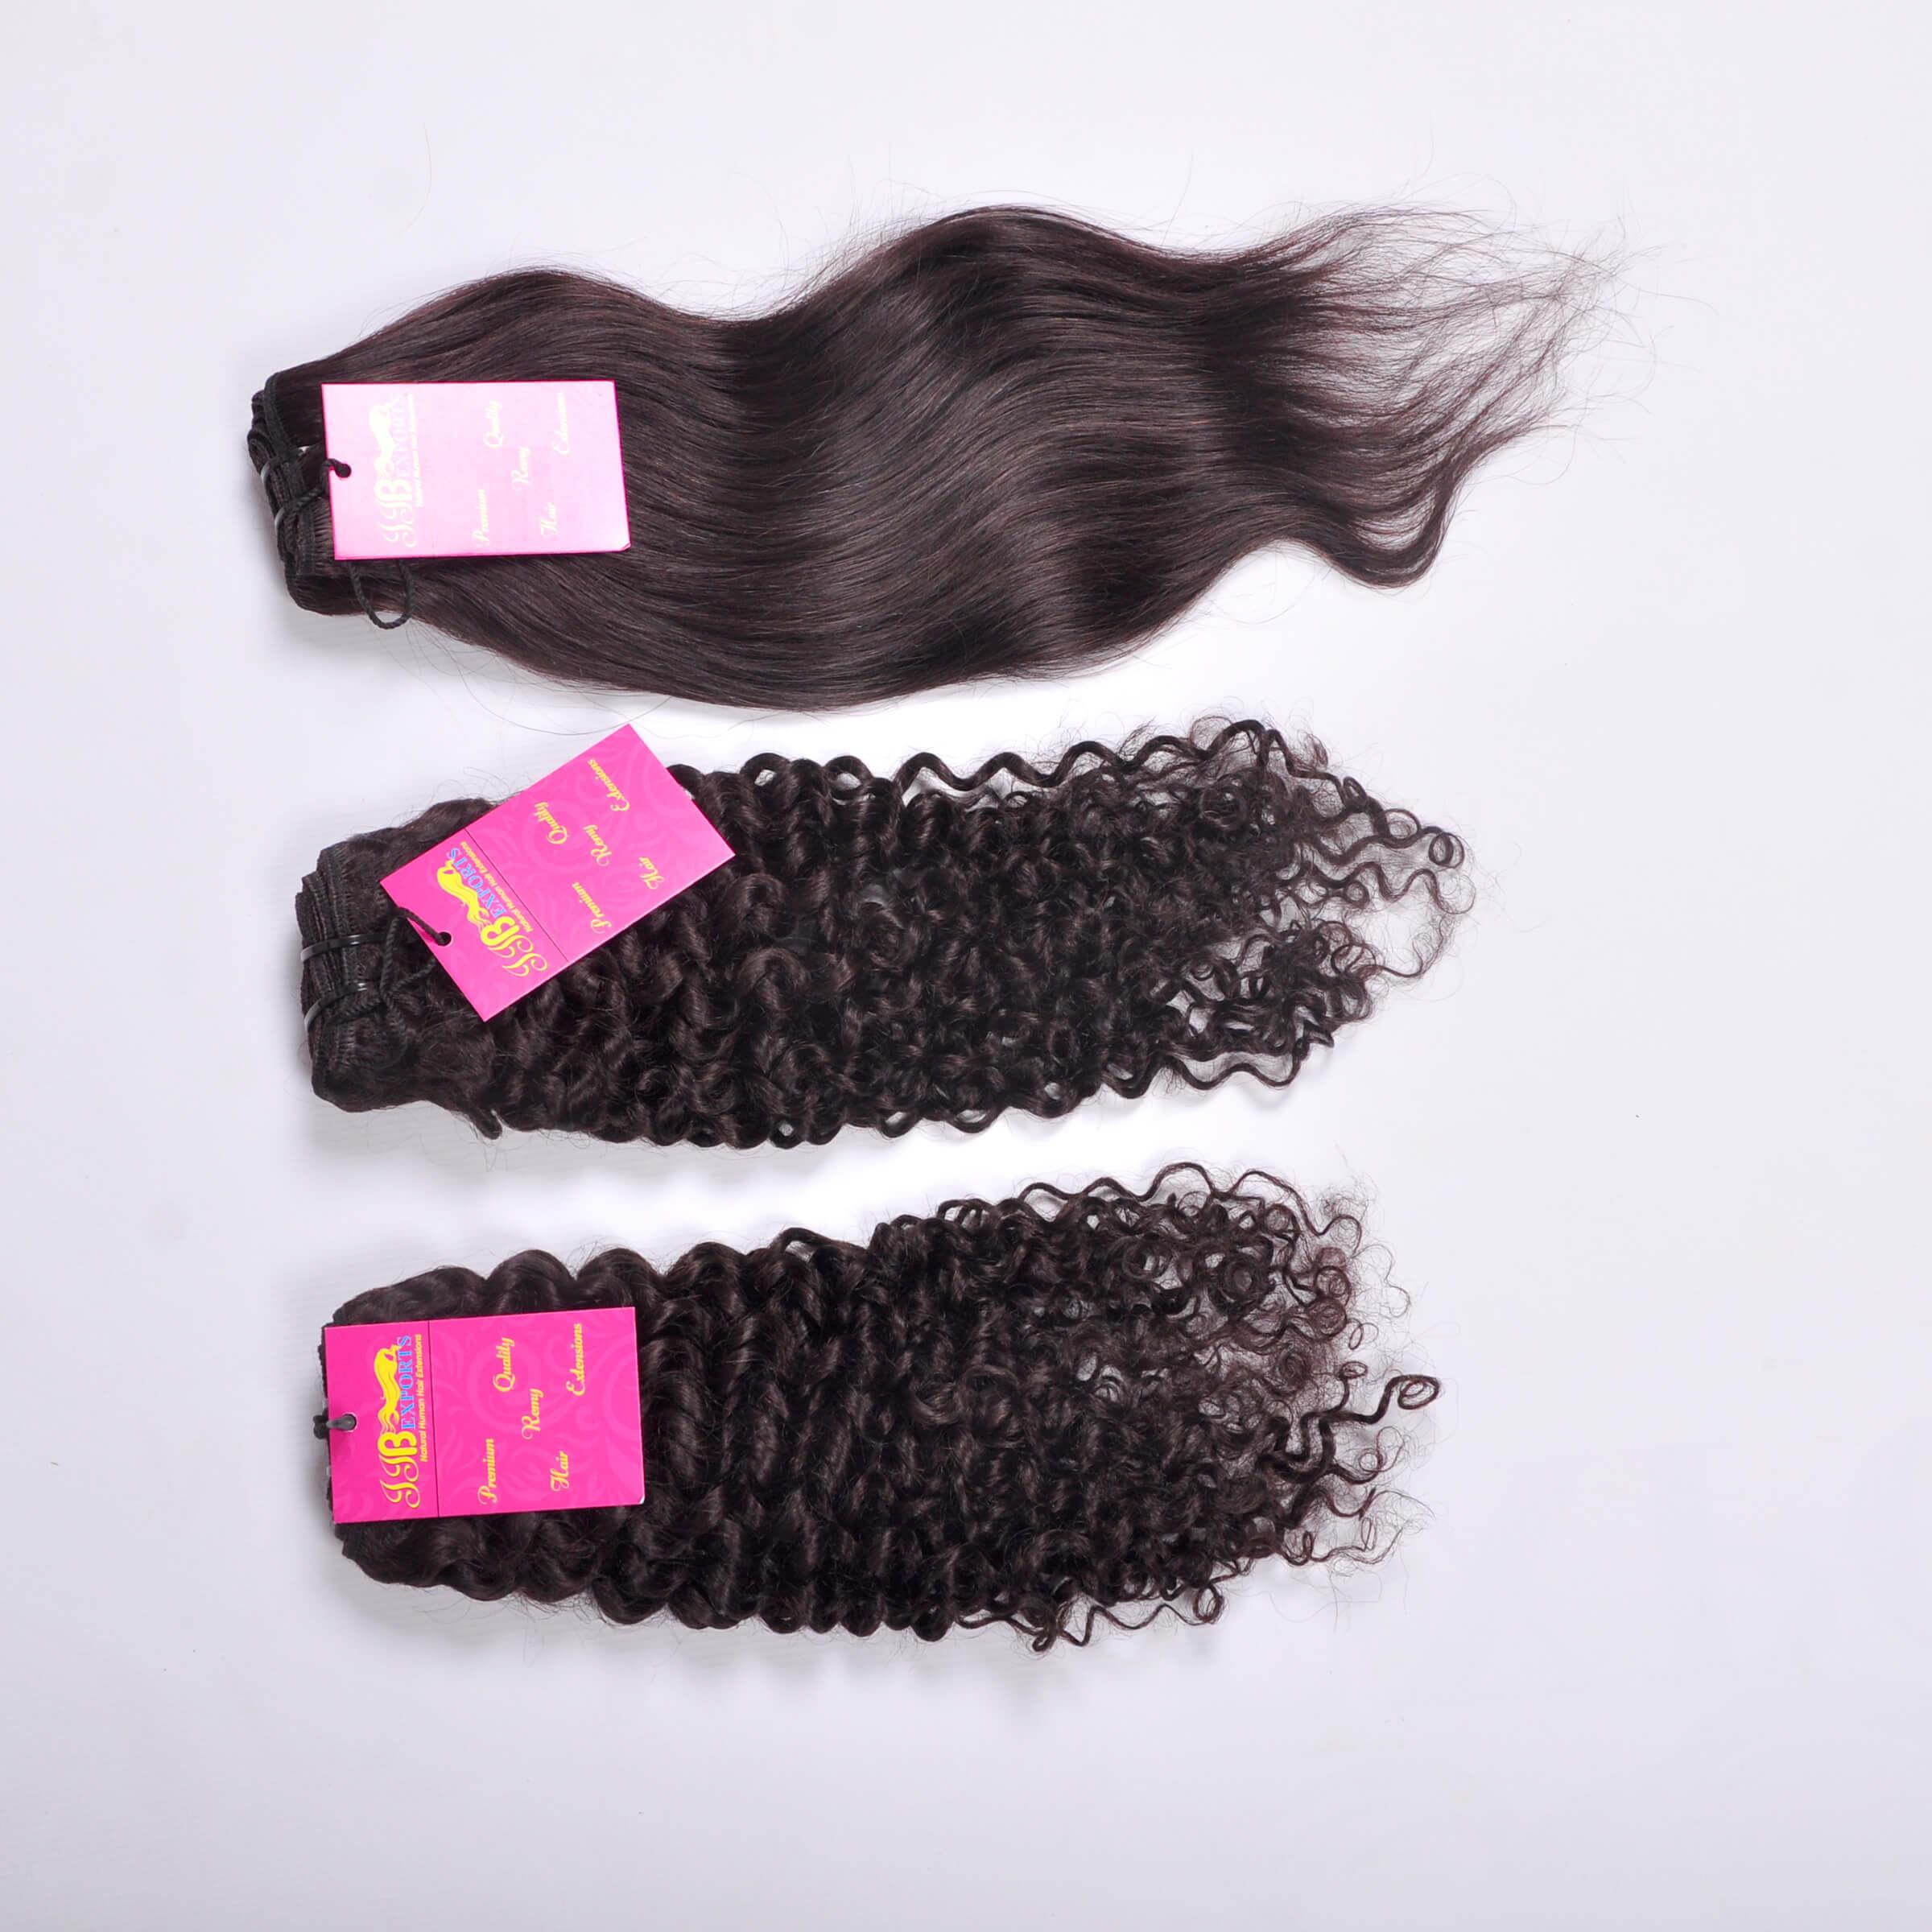 Super Single Double Drawn Straight/wavy/curly Human Hair Bundles Brazilian Raw Virgin Hair With Closure Frontal